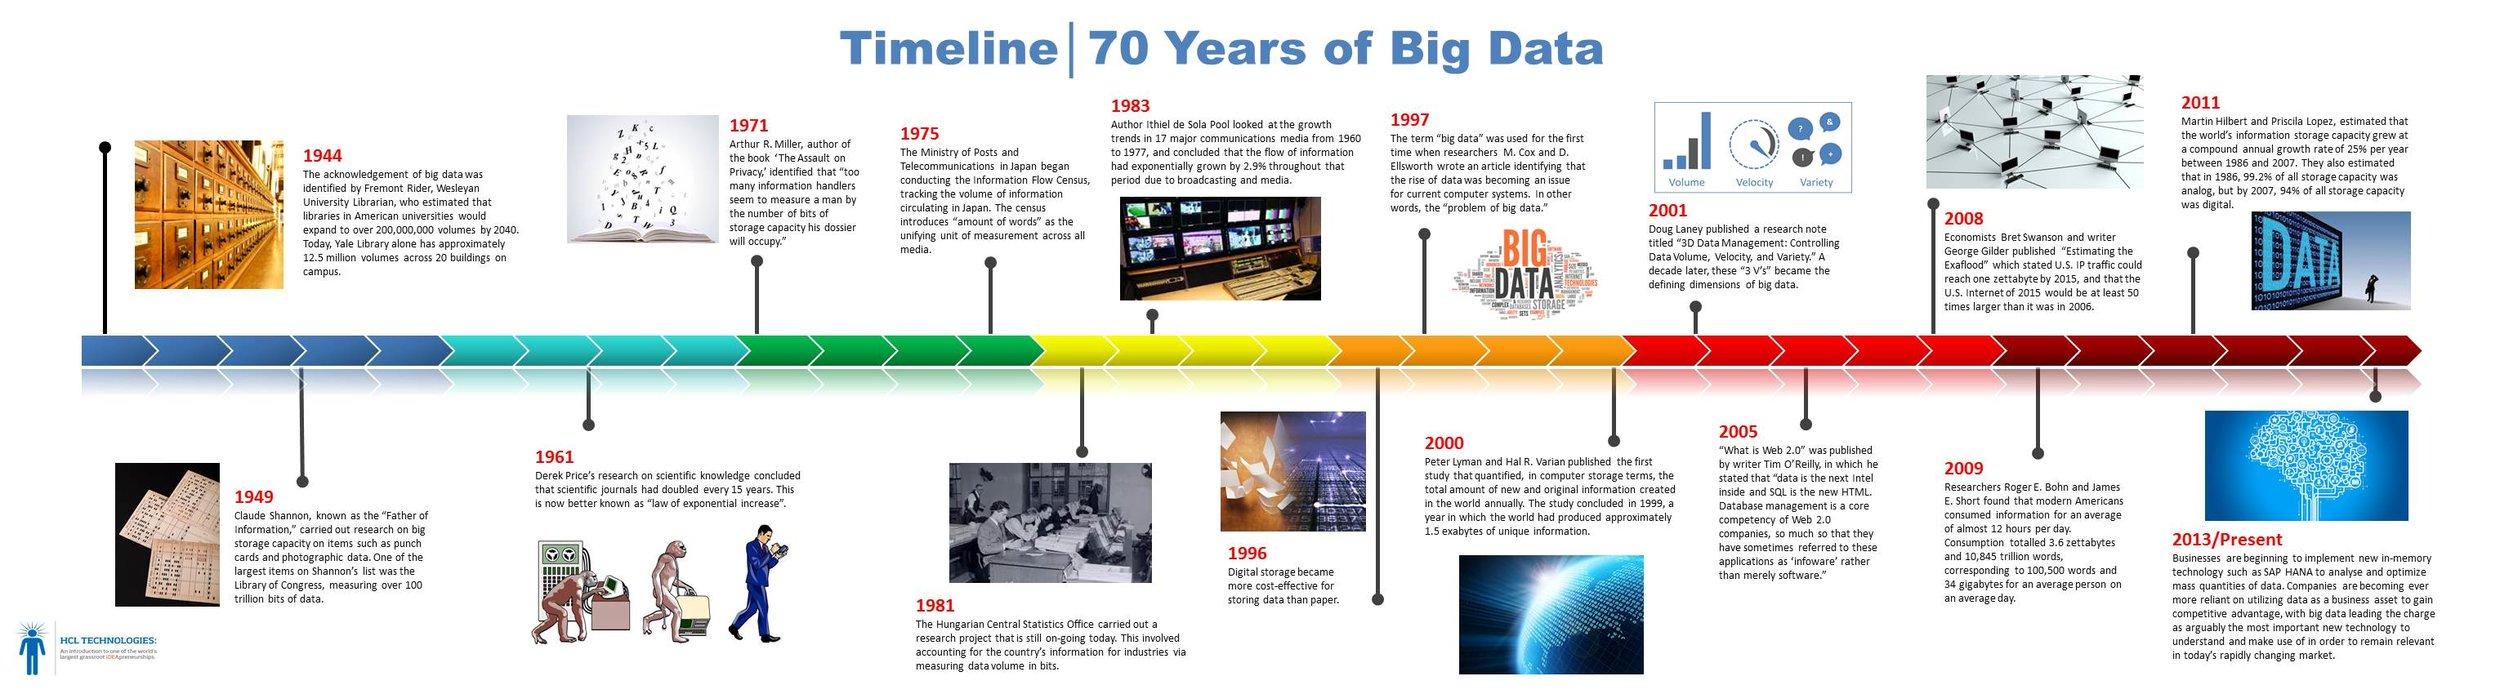 FULL ARTCLE HERE - https://www.hcltech.com/blogs/history-big-data